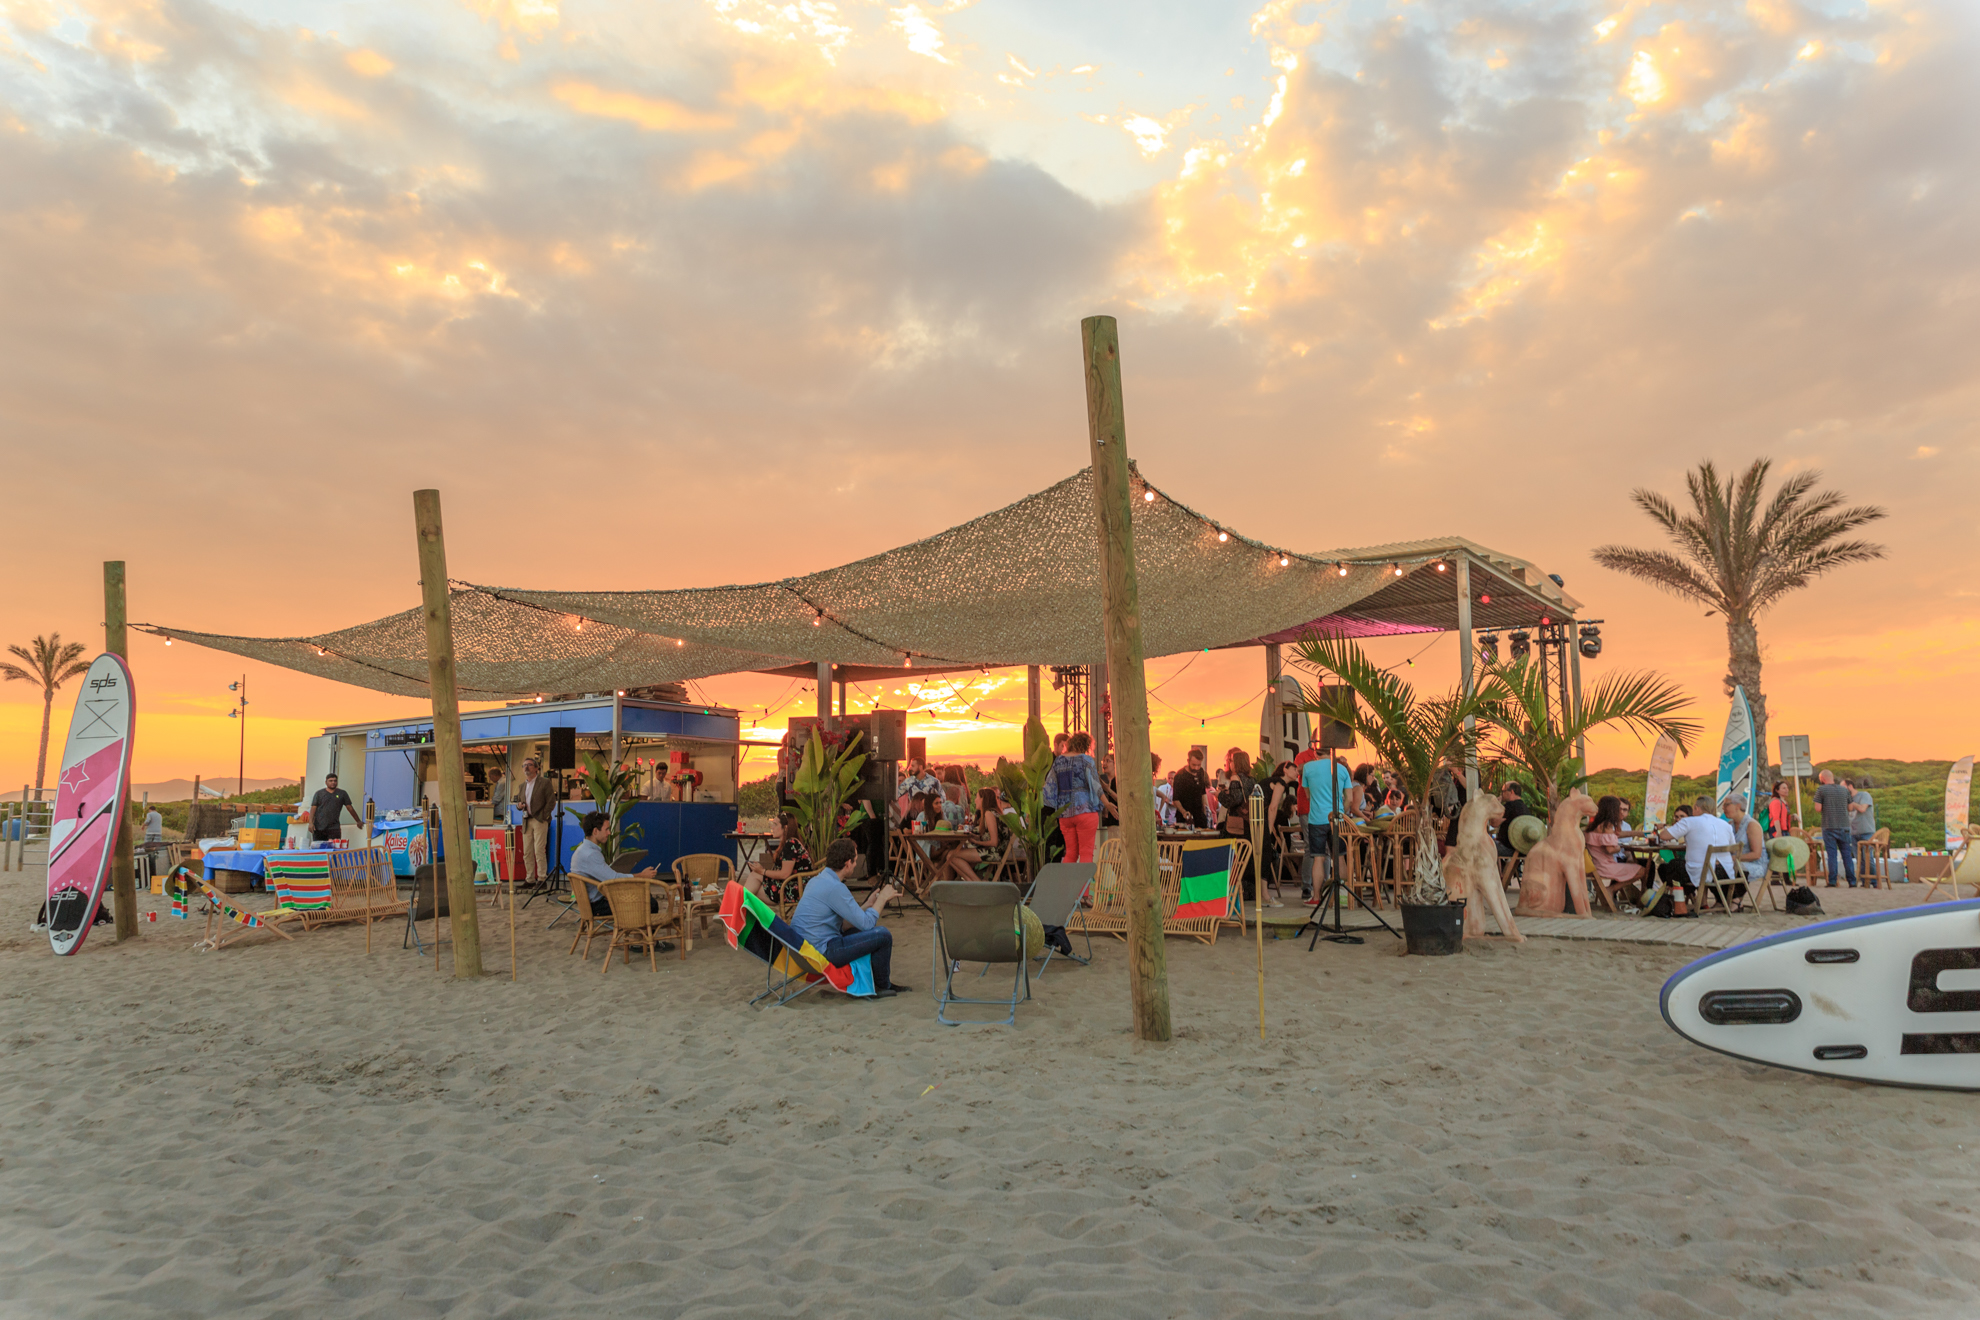 ¡El picnic de playa de El Maravillas del Prat!